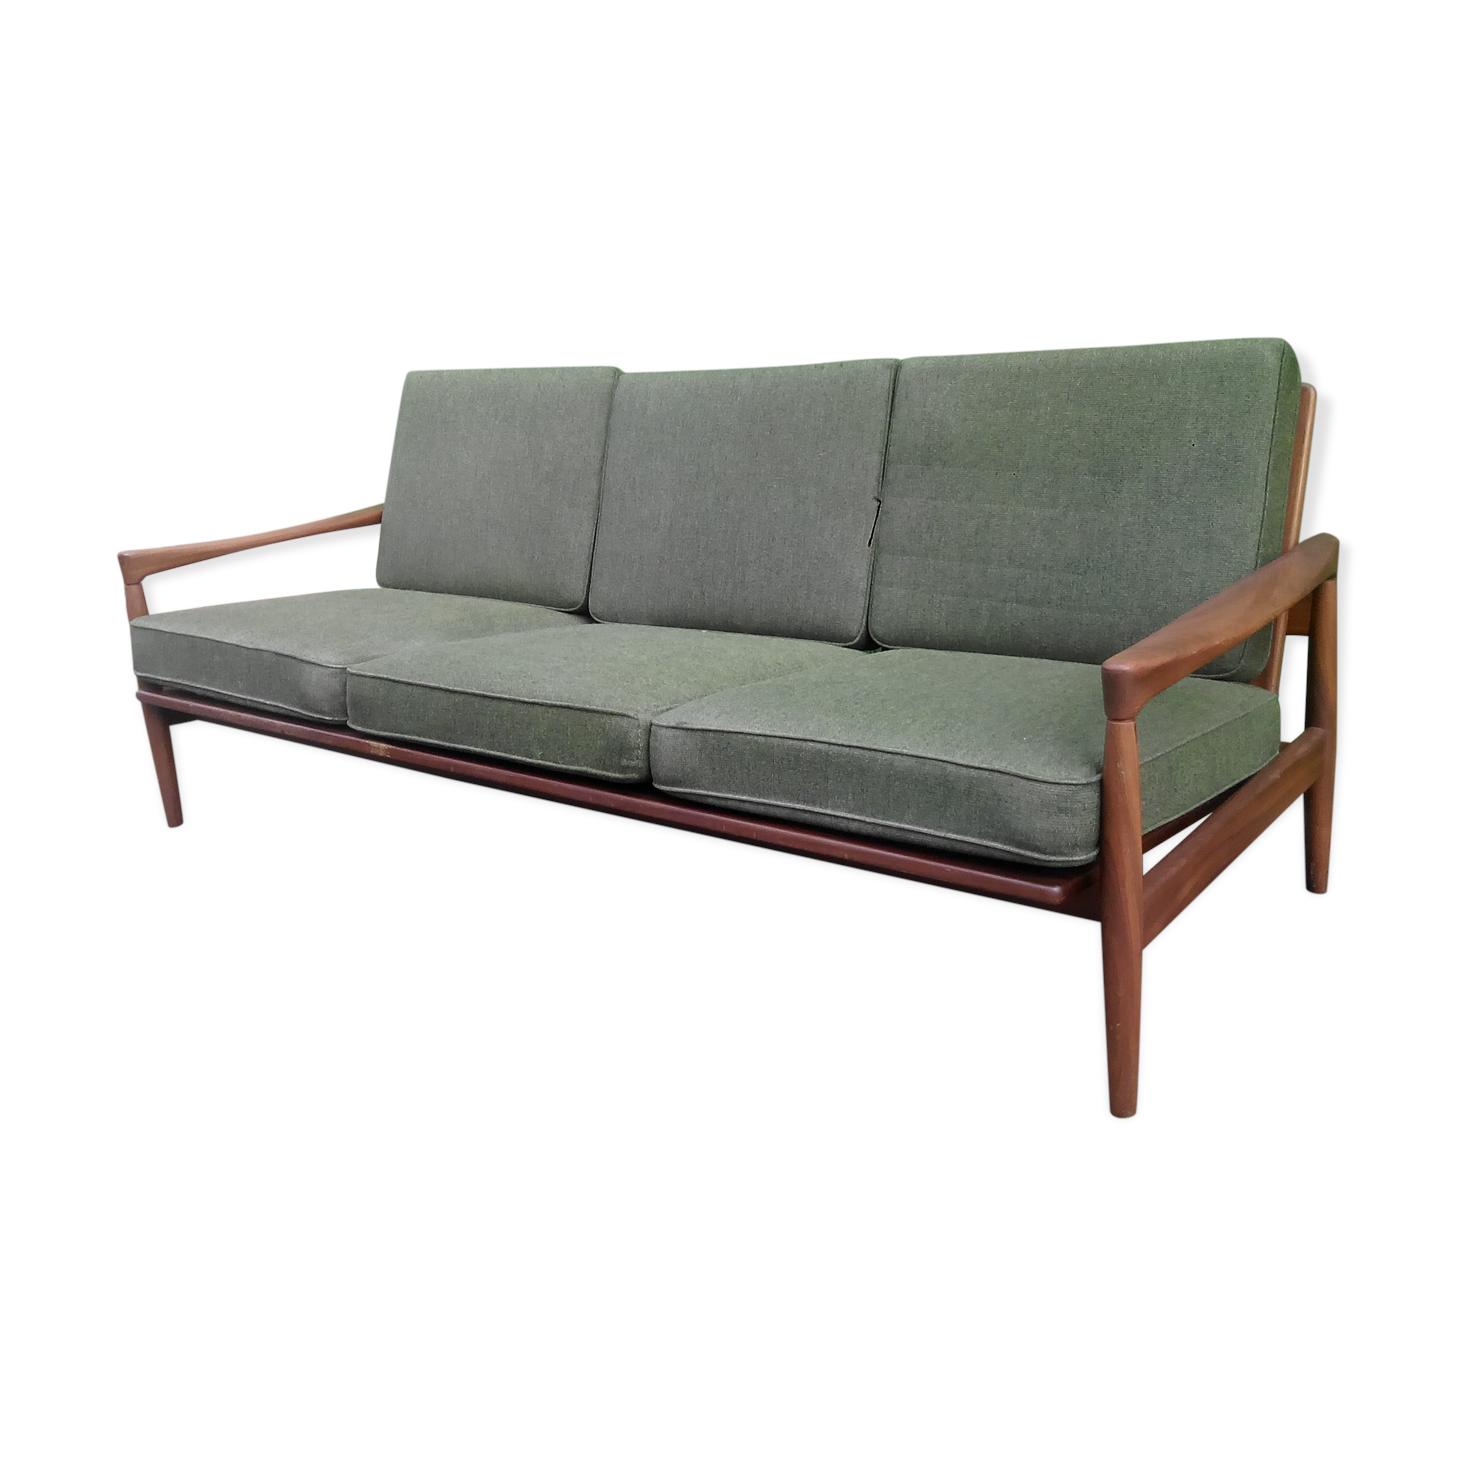 Canapé scandinave en teck vintage